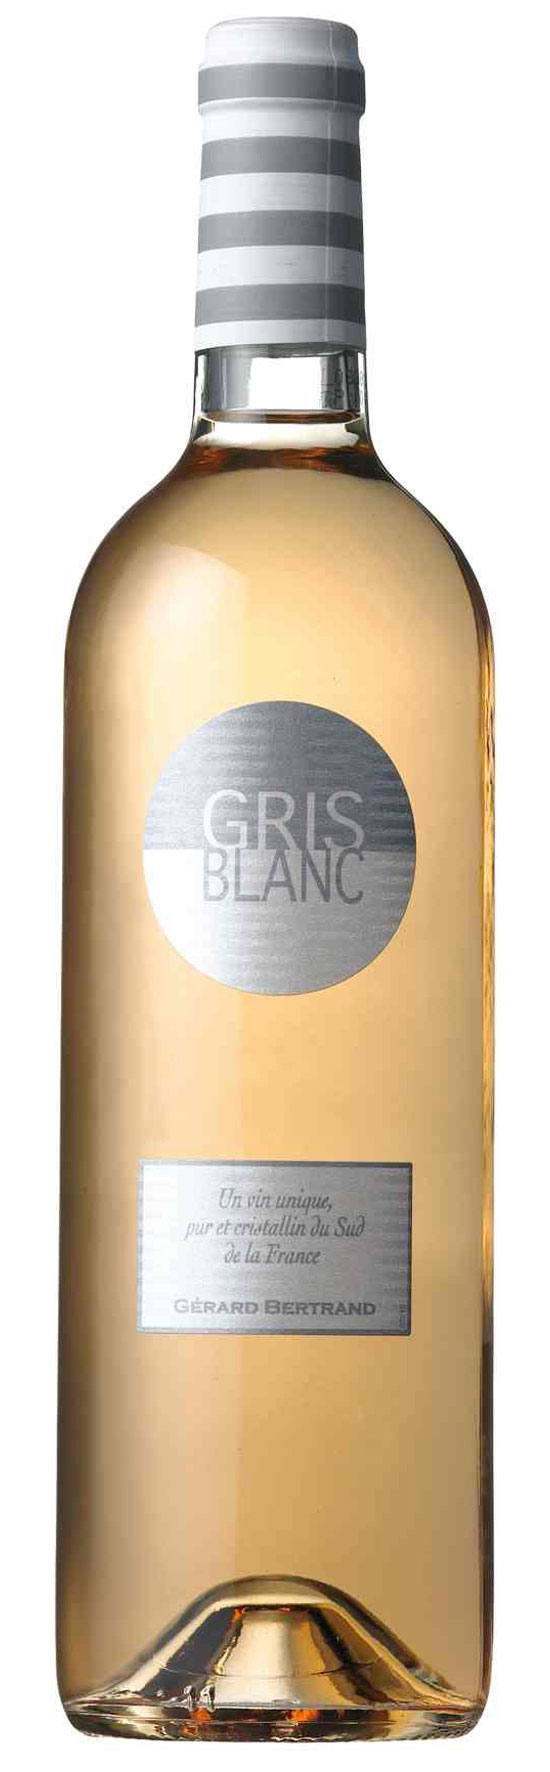 Gerard Bertrand Gris Blanc Vin de Pays 2019